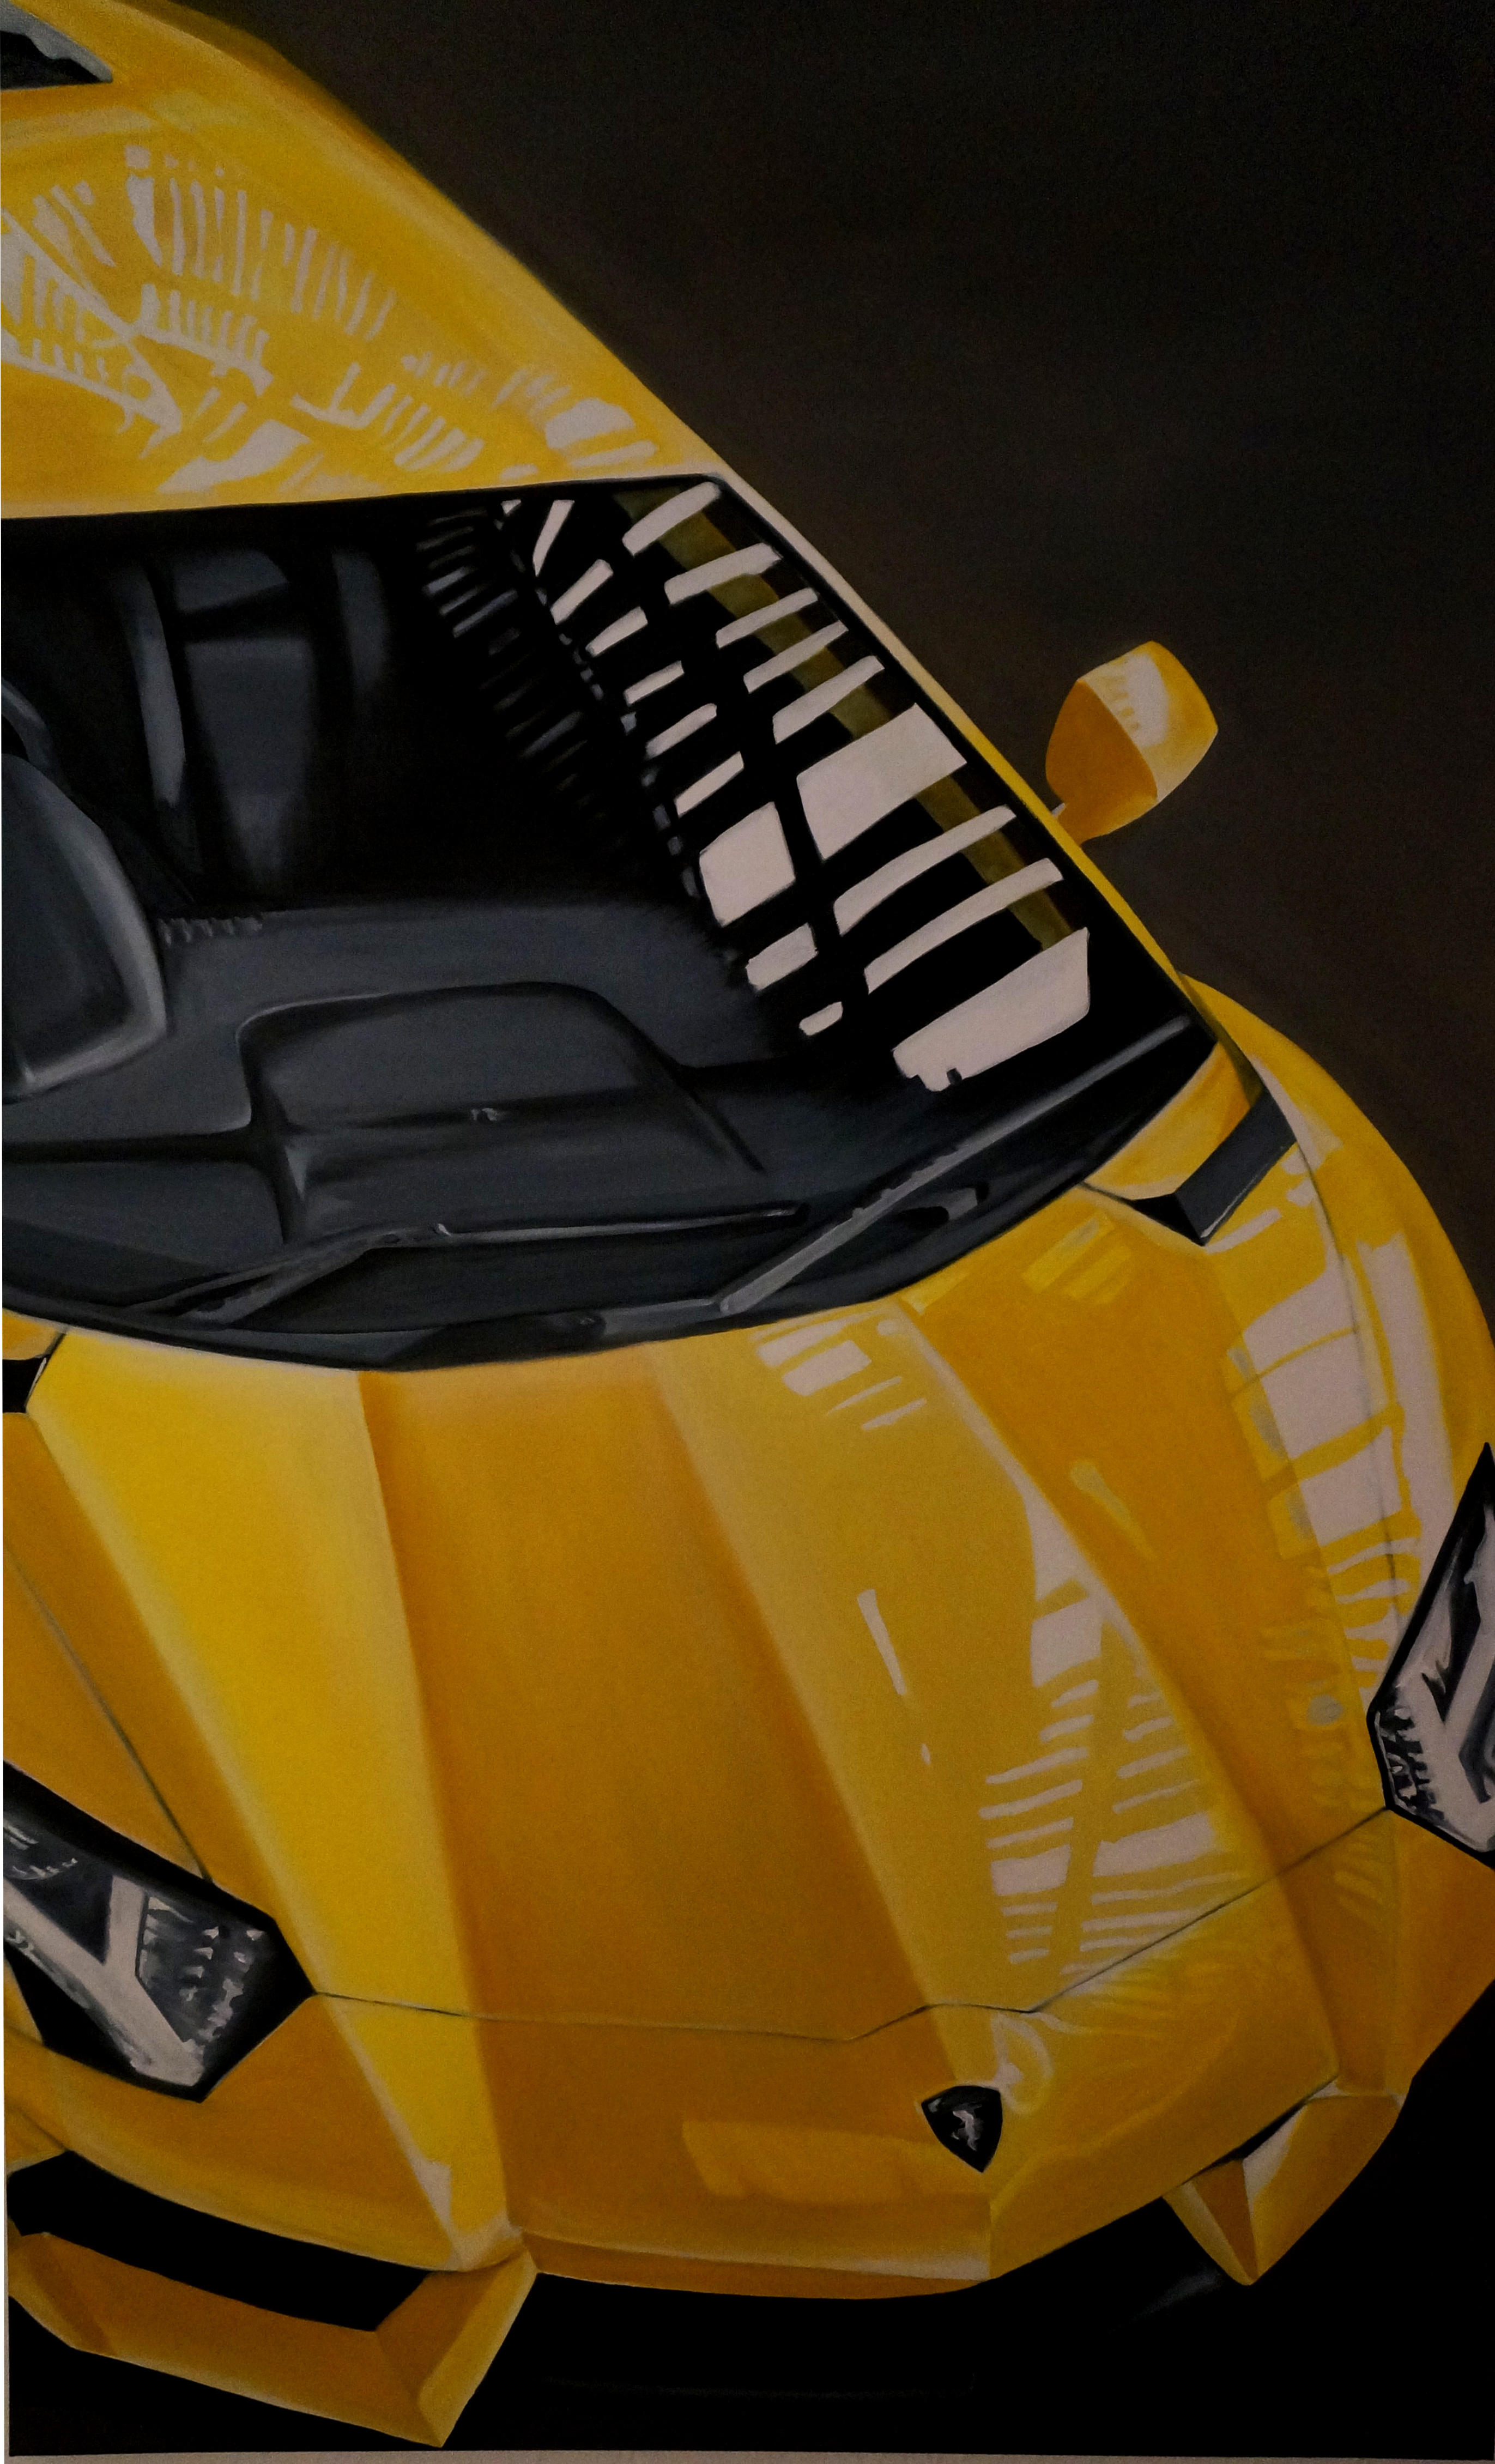 Lamborghini | Öl auf Leinwand | 130 x 80 cm